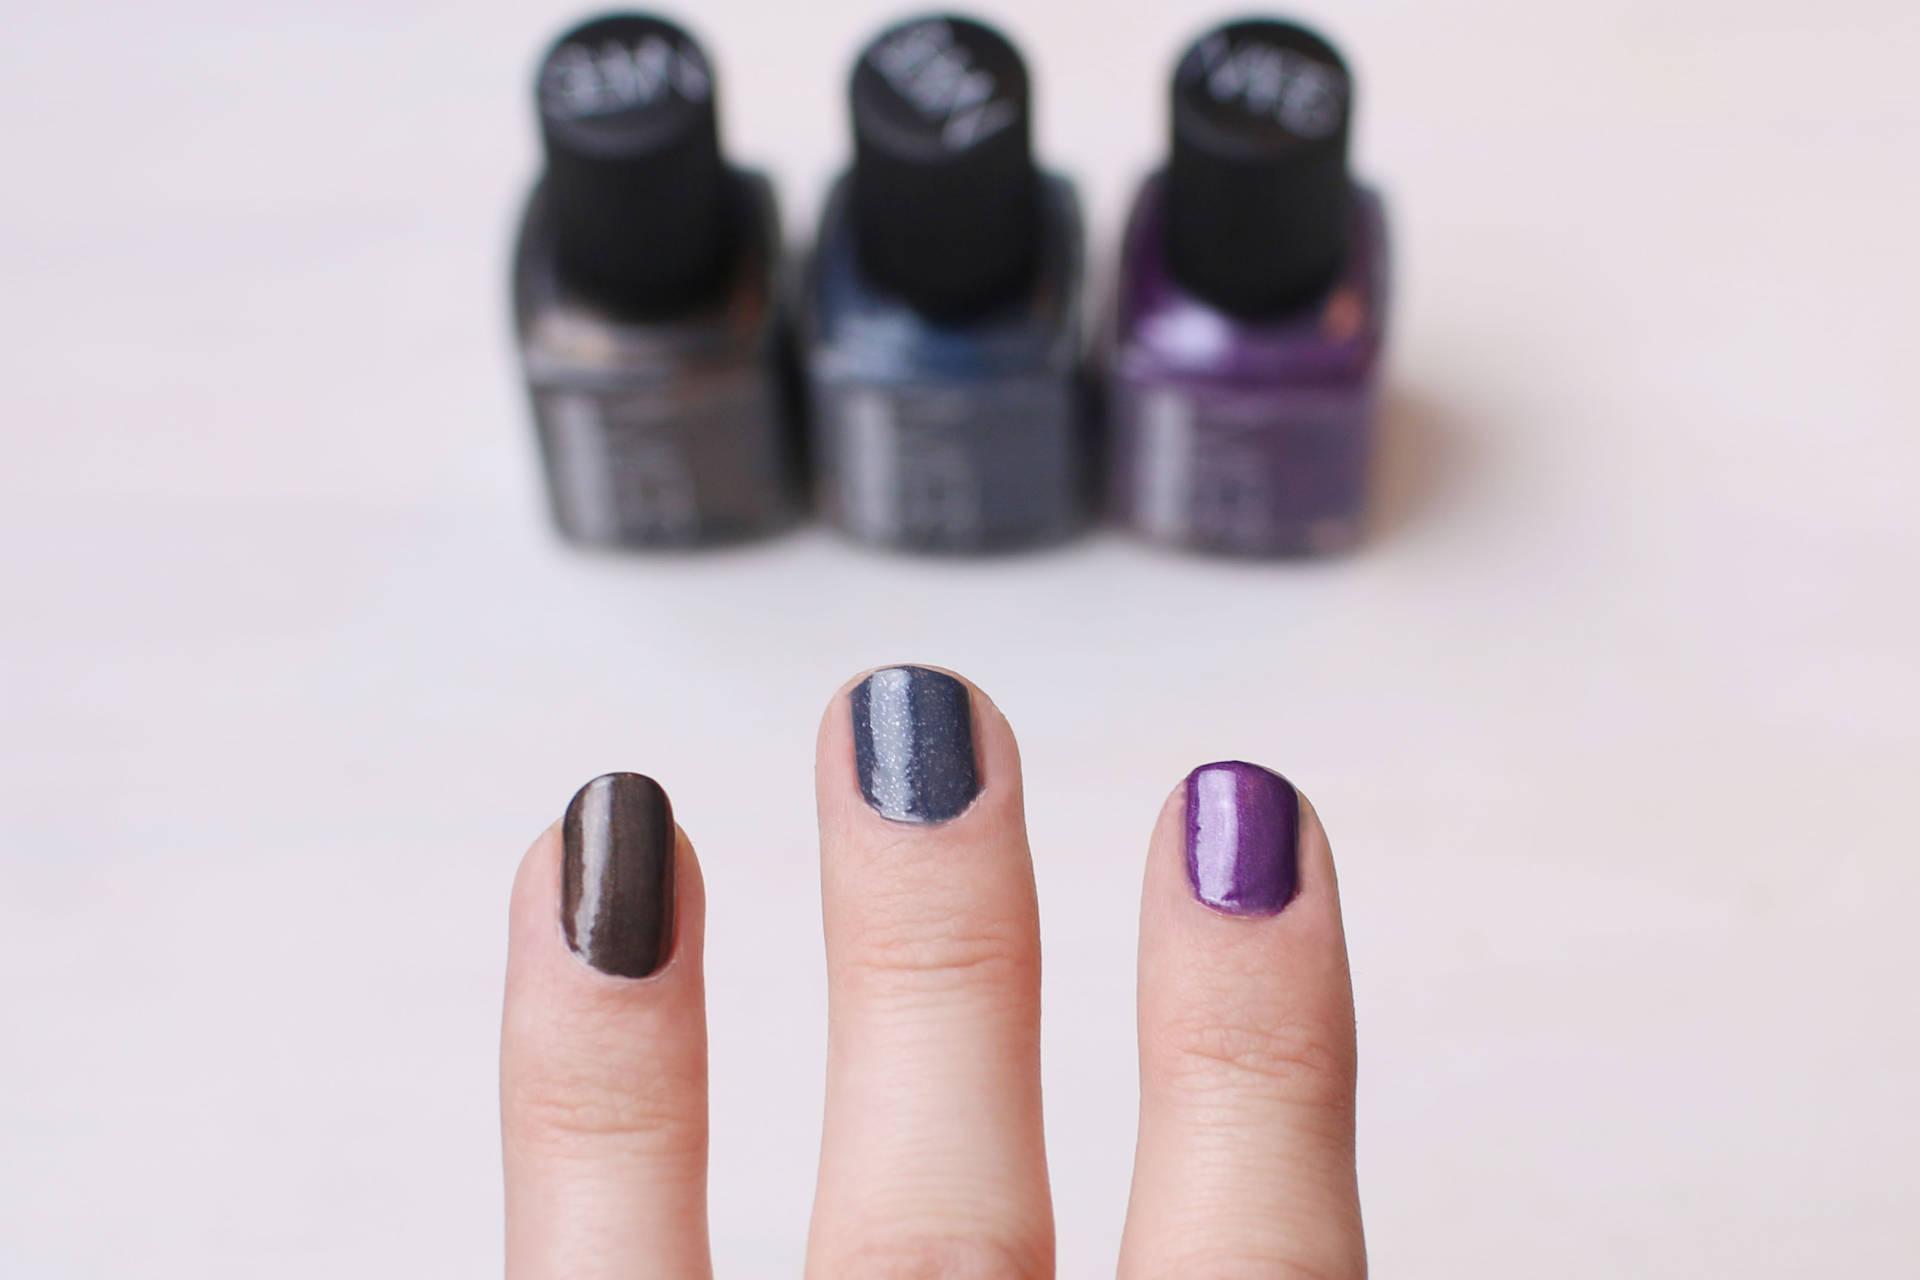 nars x steven klein nail varnishes